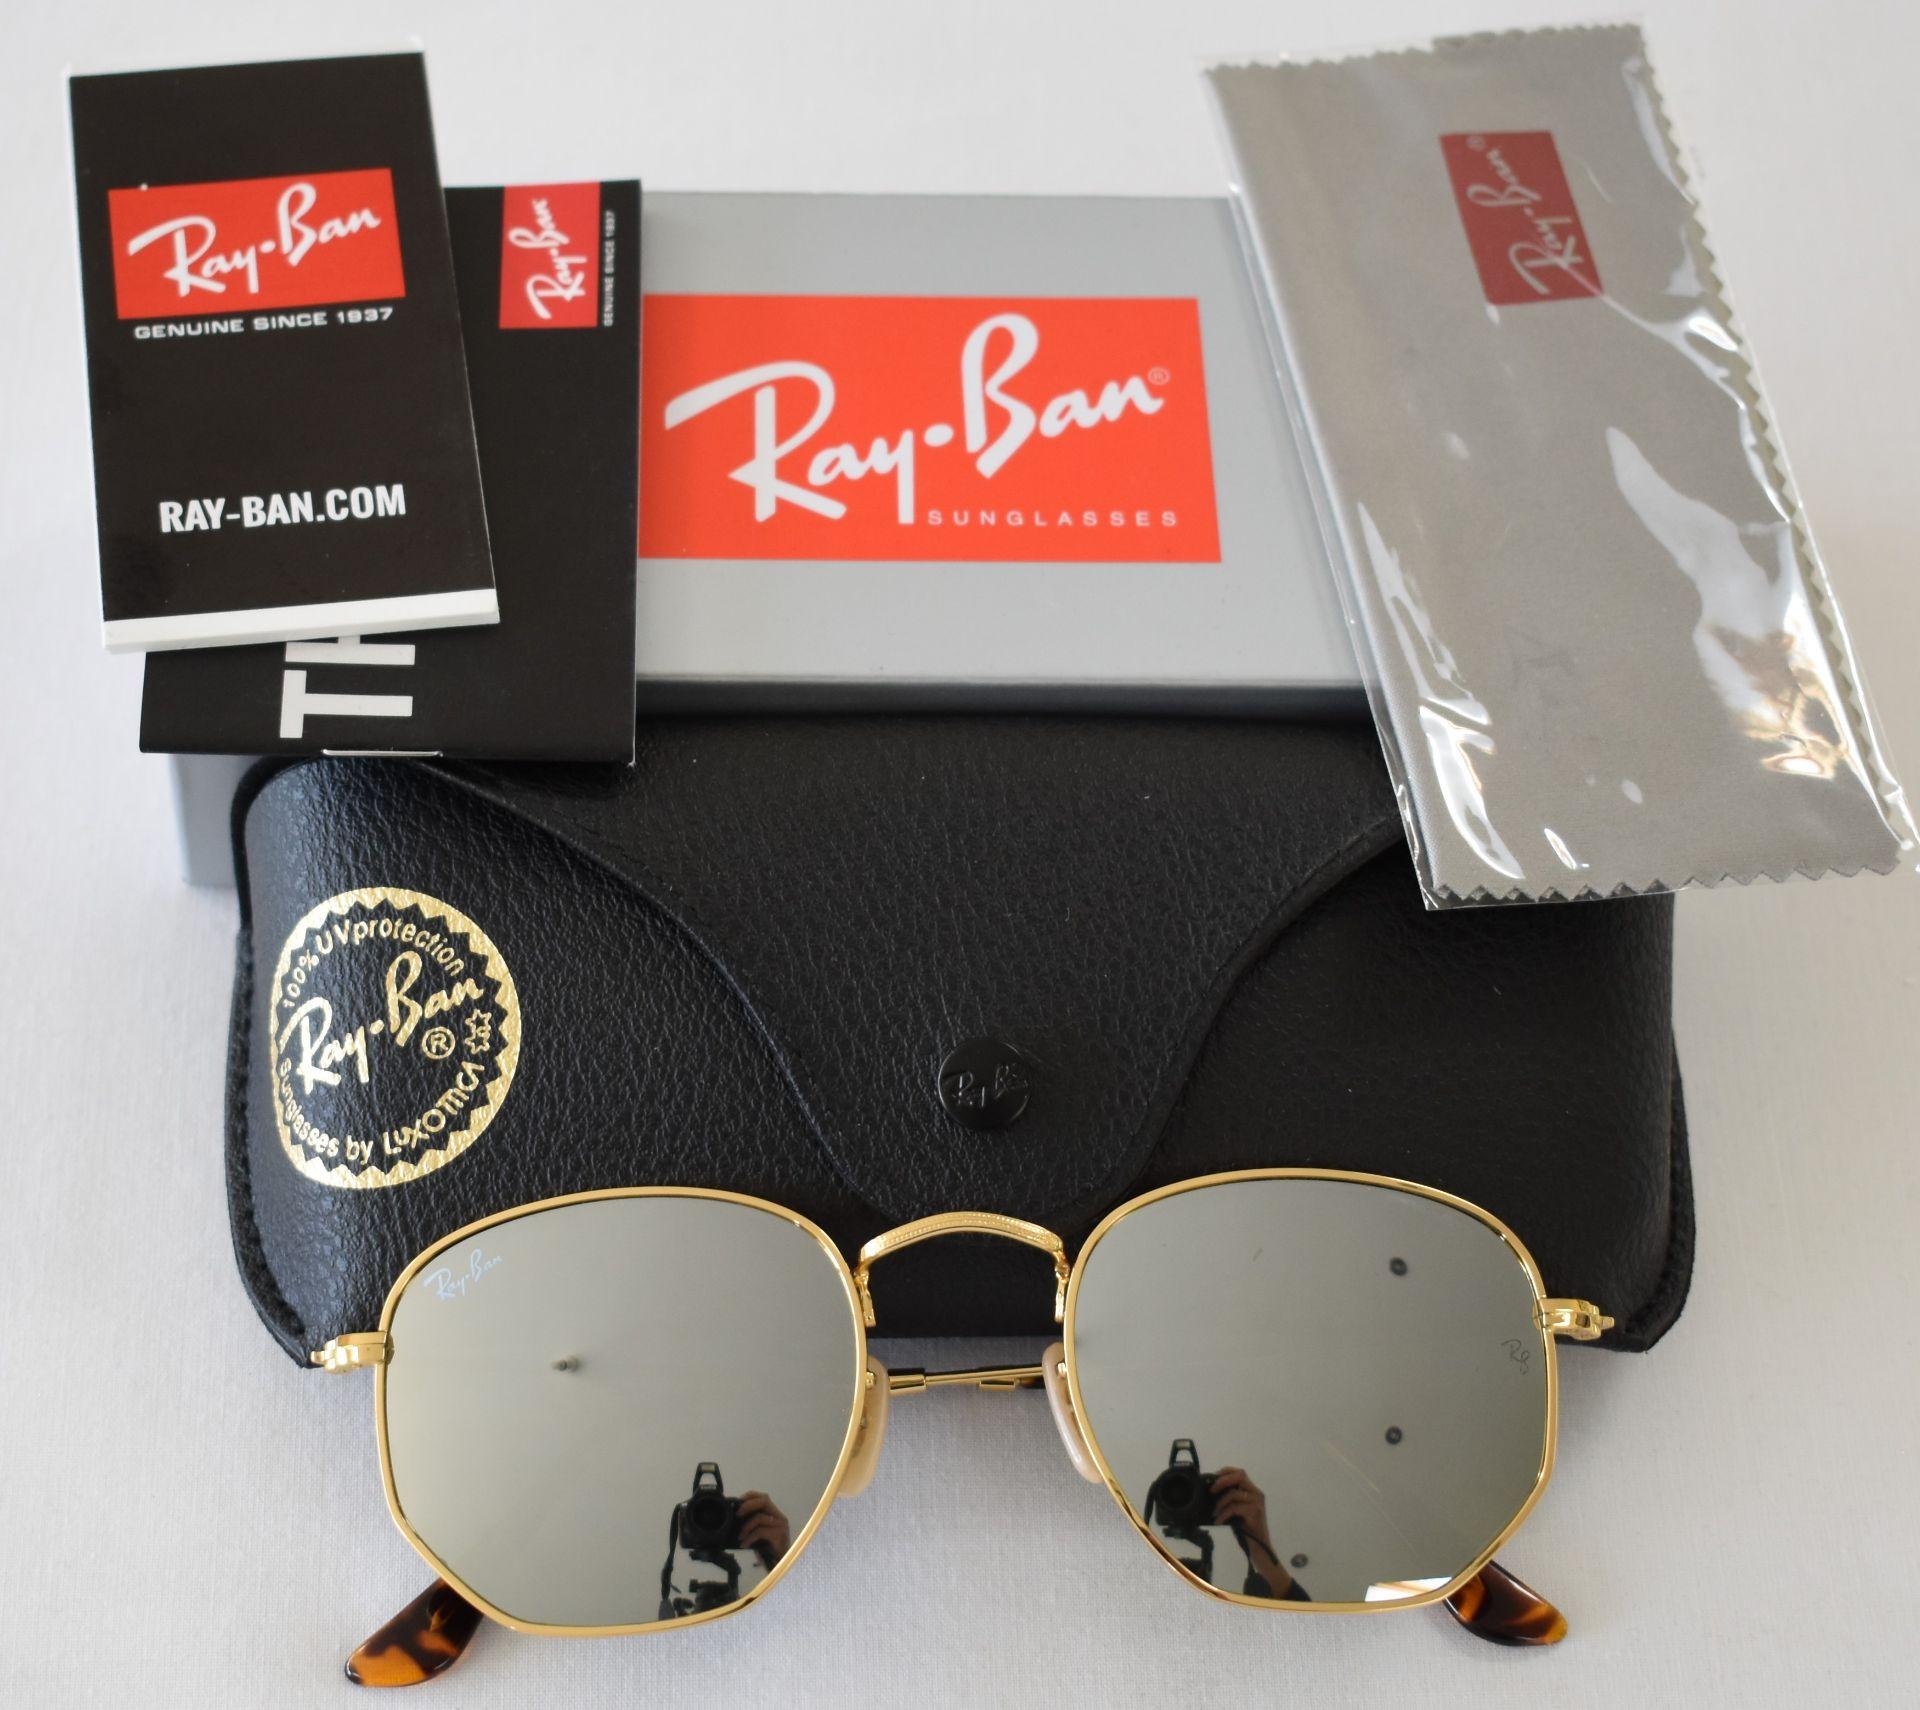 Ray Ban Sunglasses ORB3548N 001/30 *2N - Image 2 of 2